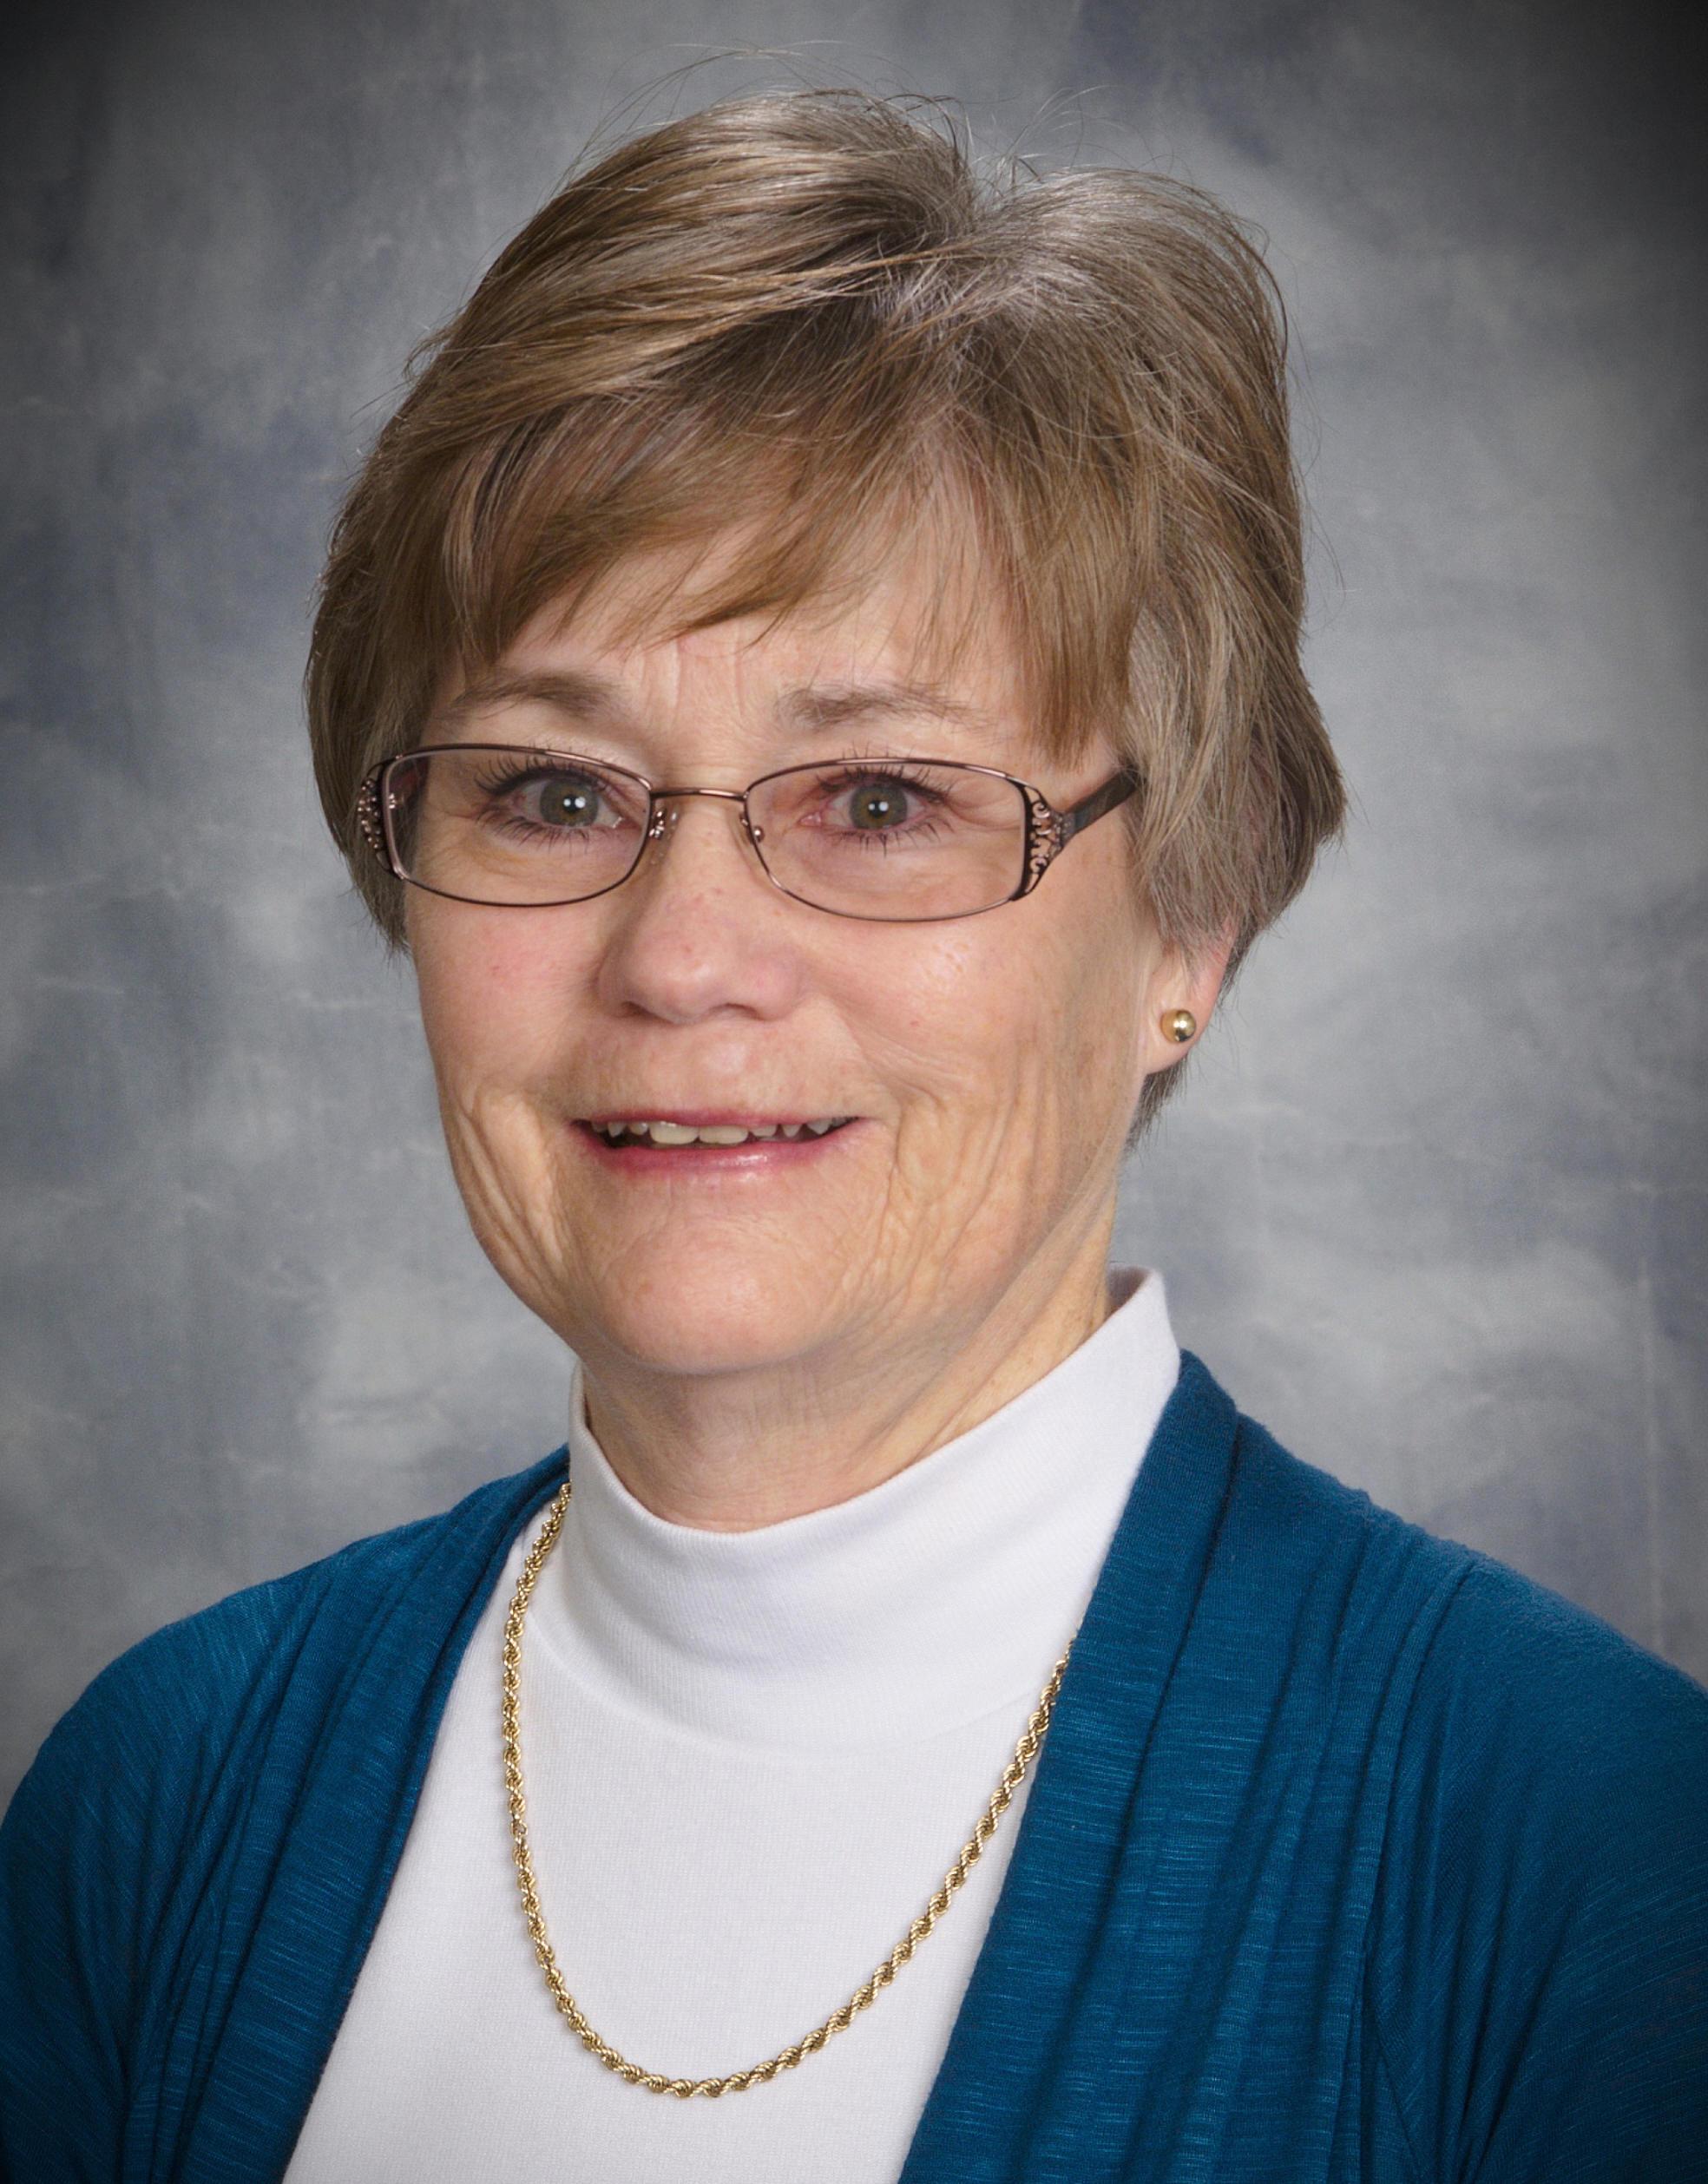 Corinne McCafferty